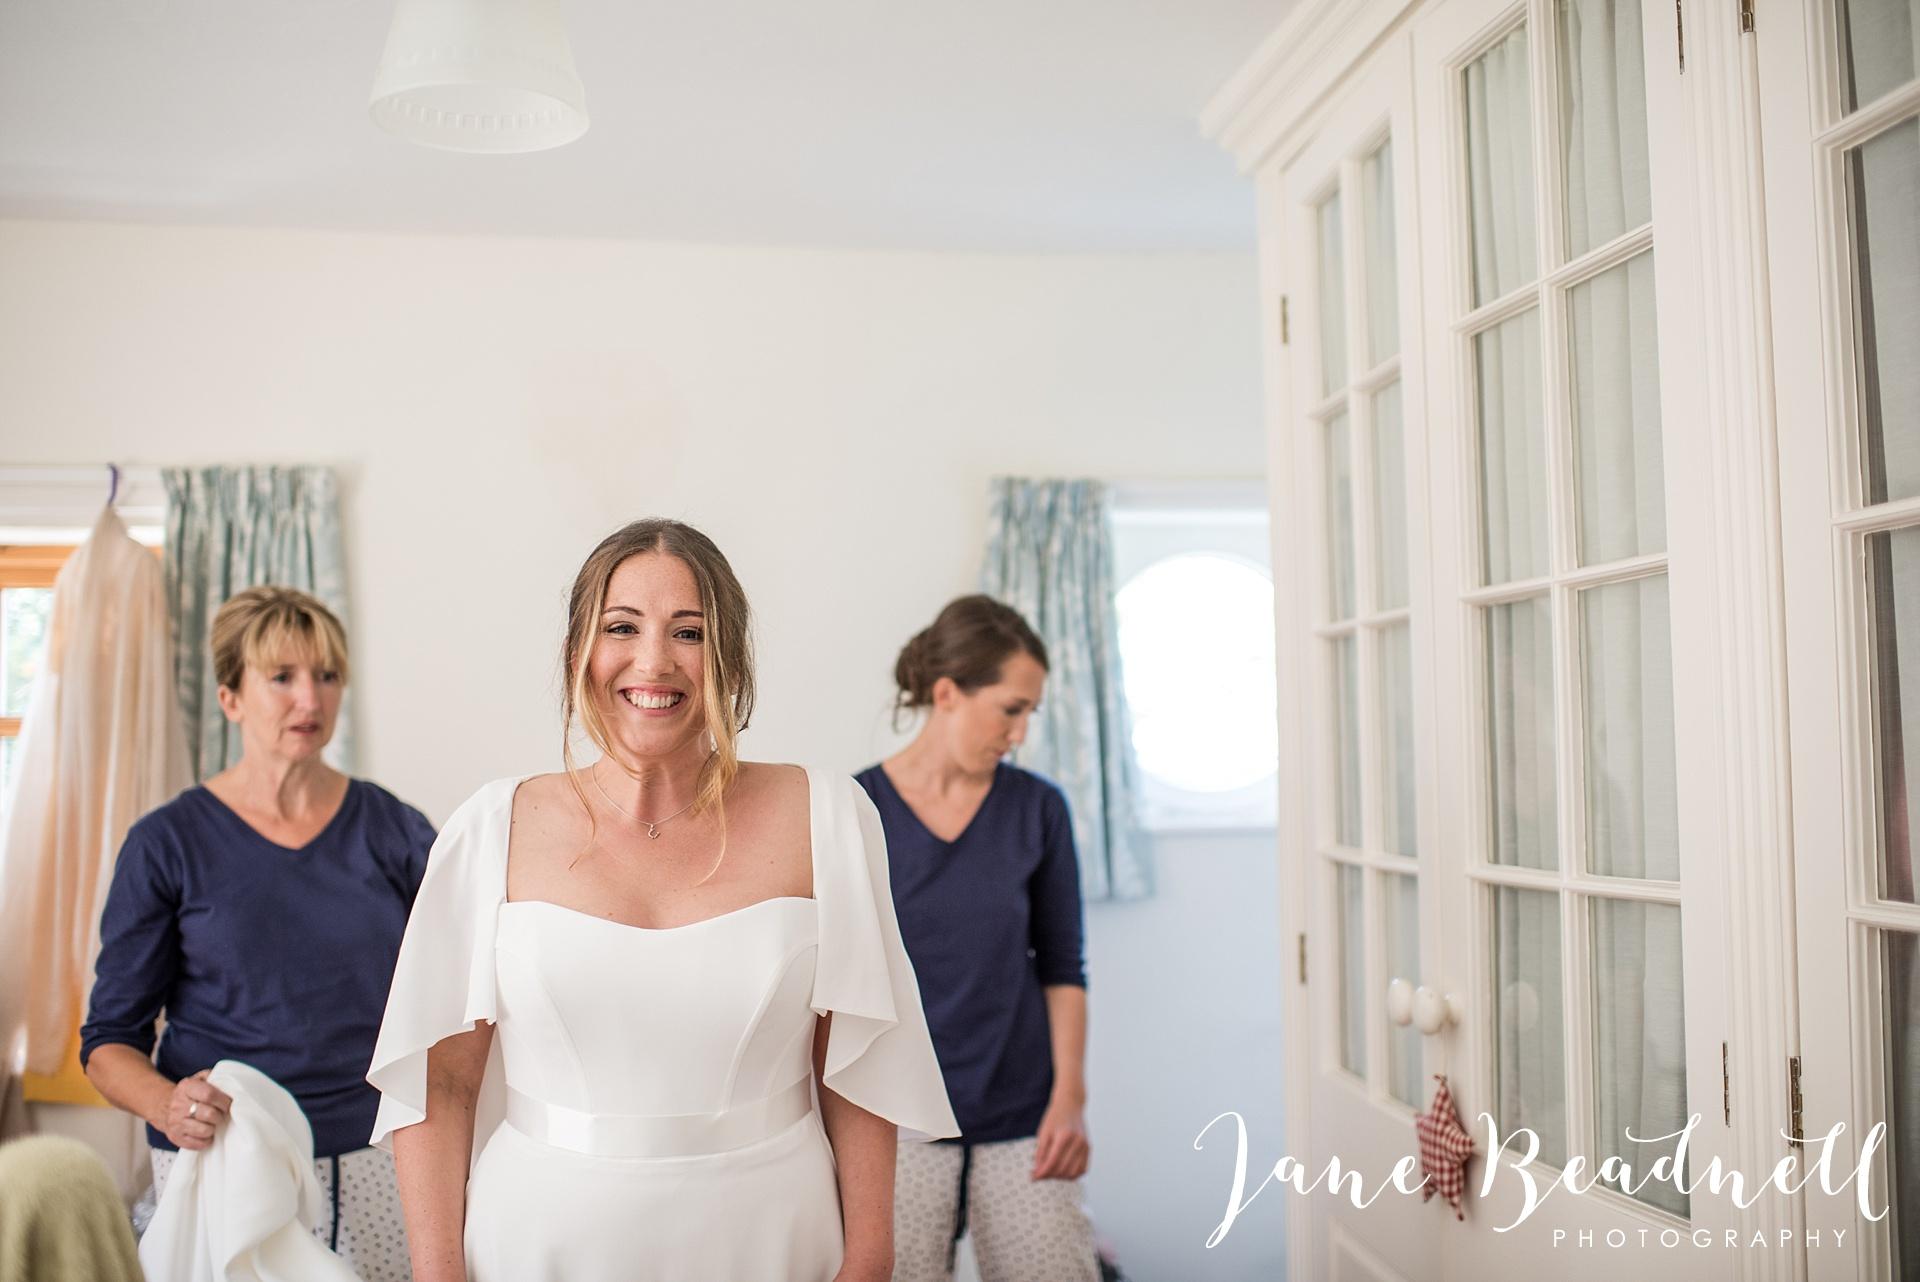 fine-art-wedding-photographer-jane-beadnell-yorkshire-wedding-photographer_0023